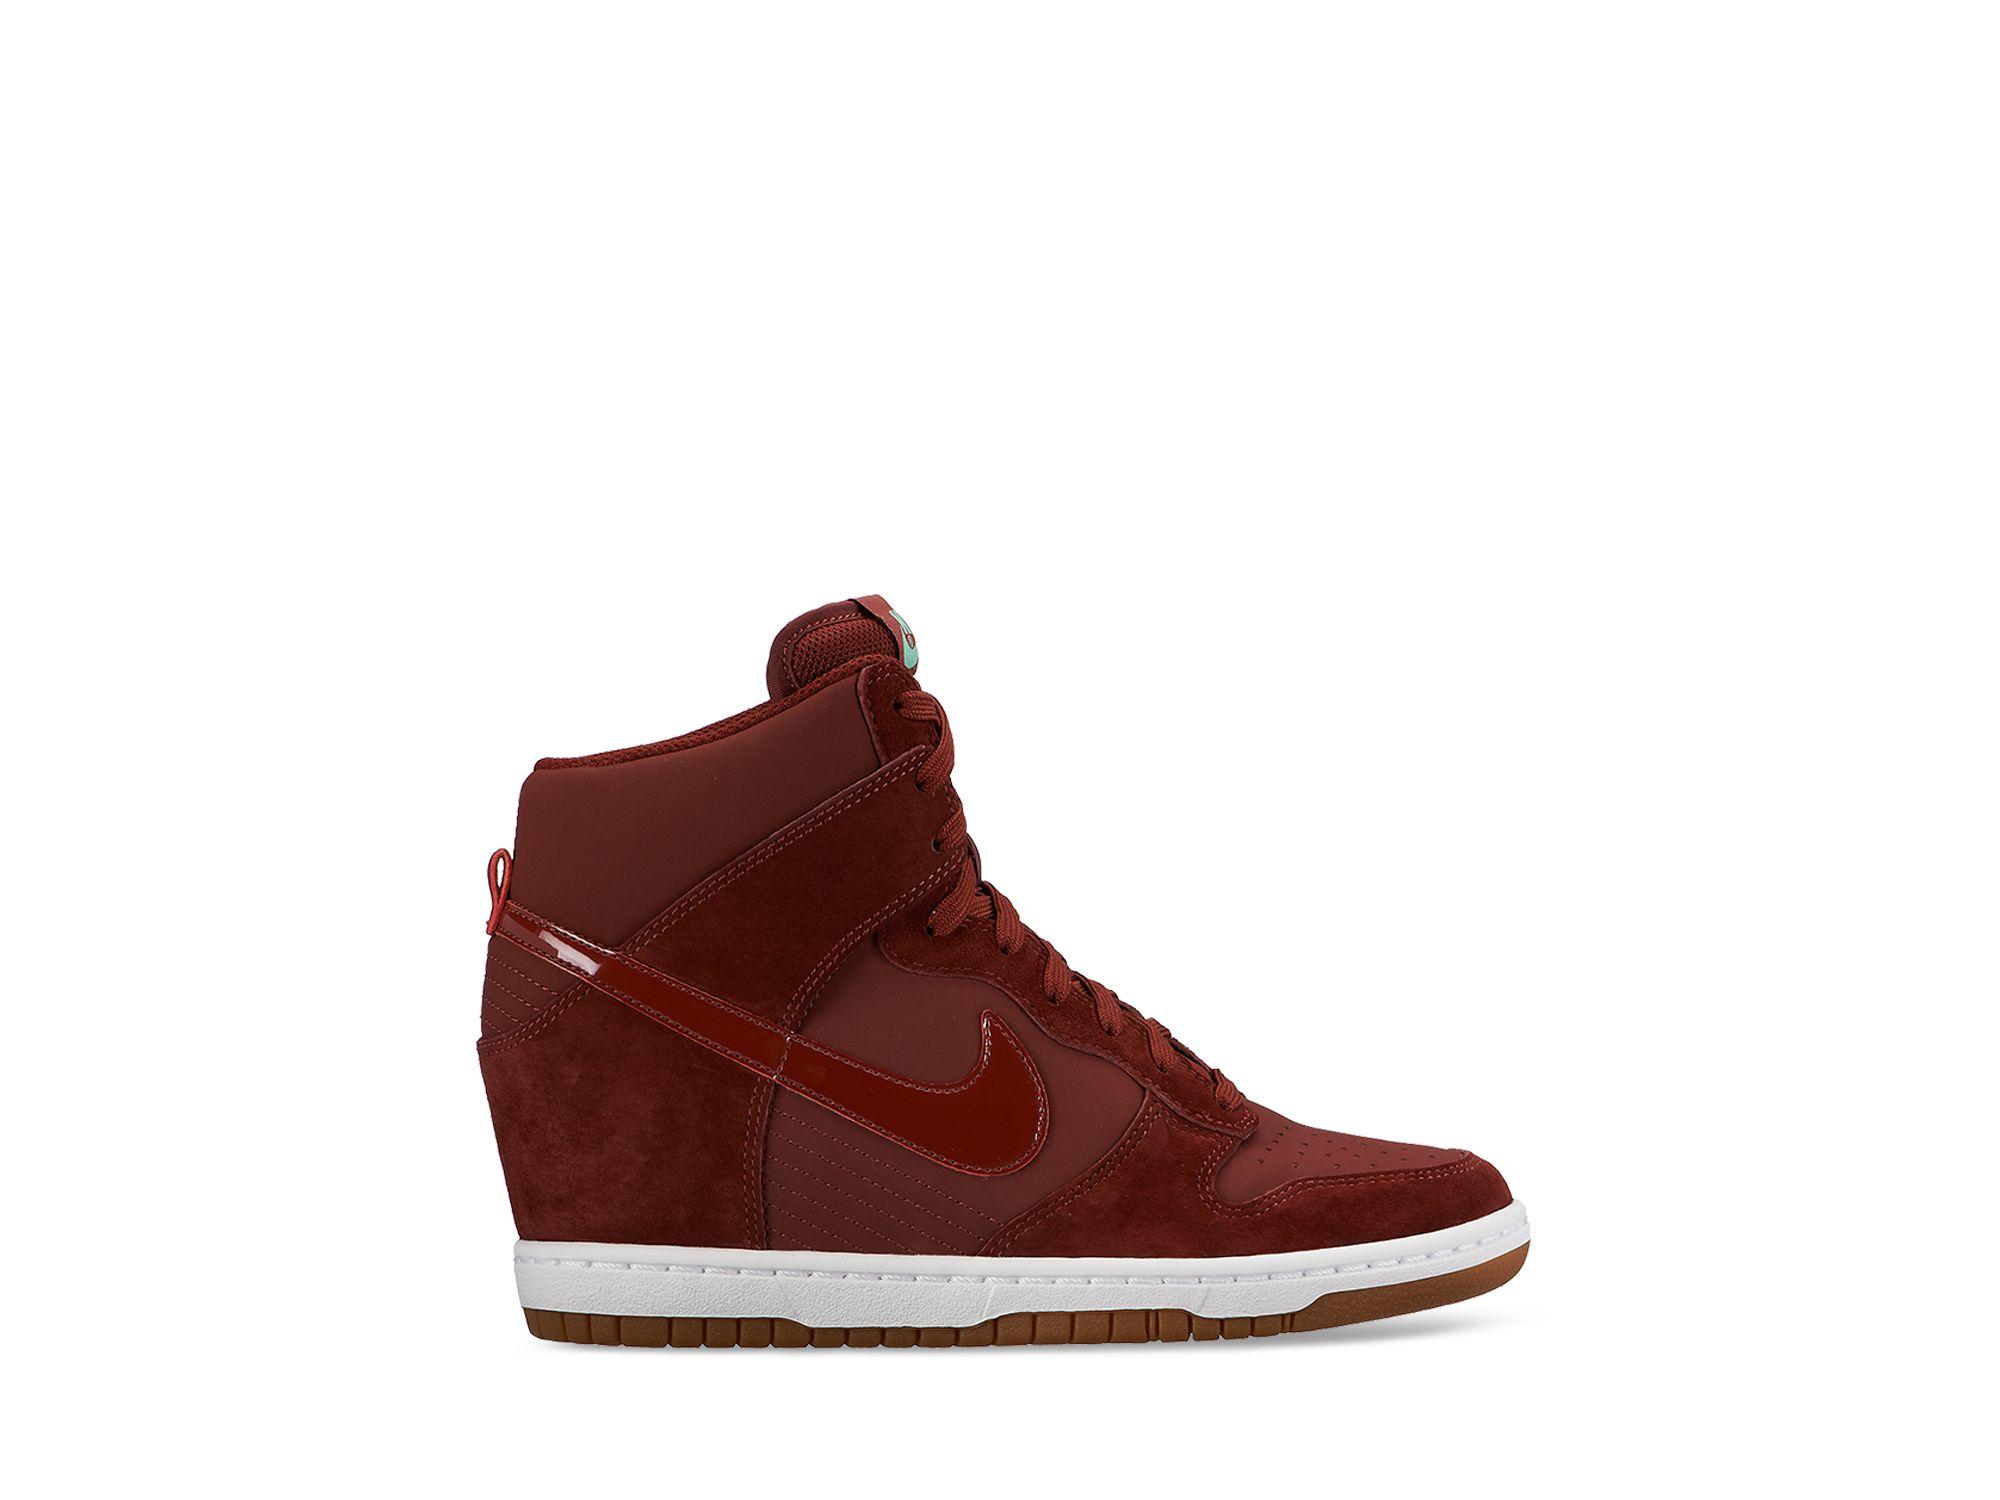 cb7ec9aed687 ... sky hi top hidden wedge shoe 528899 501 purple d6086 3a038  buy  gallery. previously sold at bloomingdales womens wedge sneakers womens nike  dunk womens ...